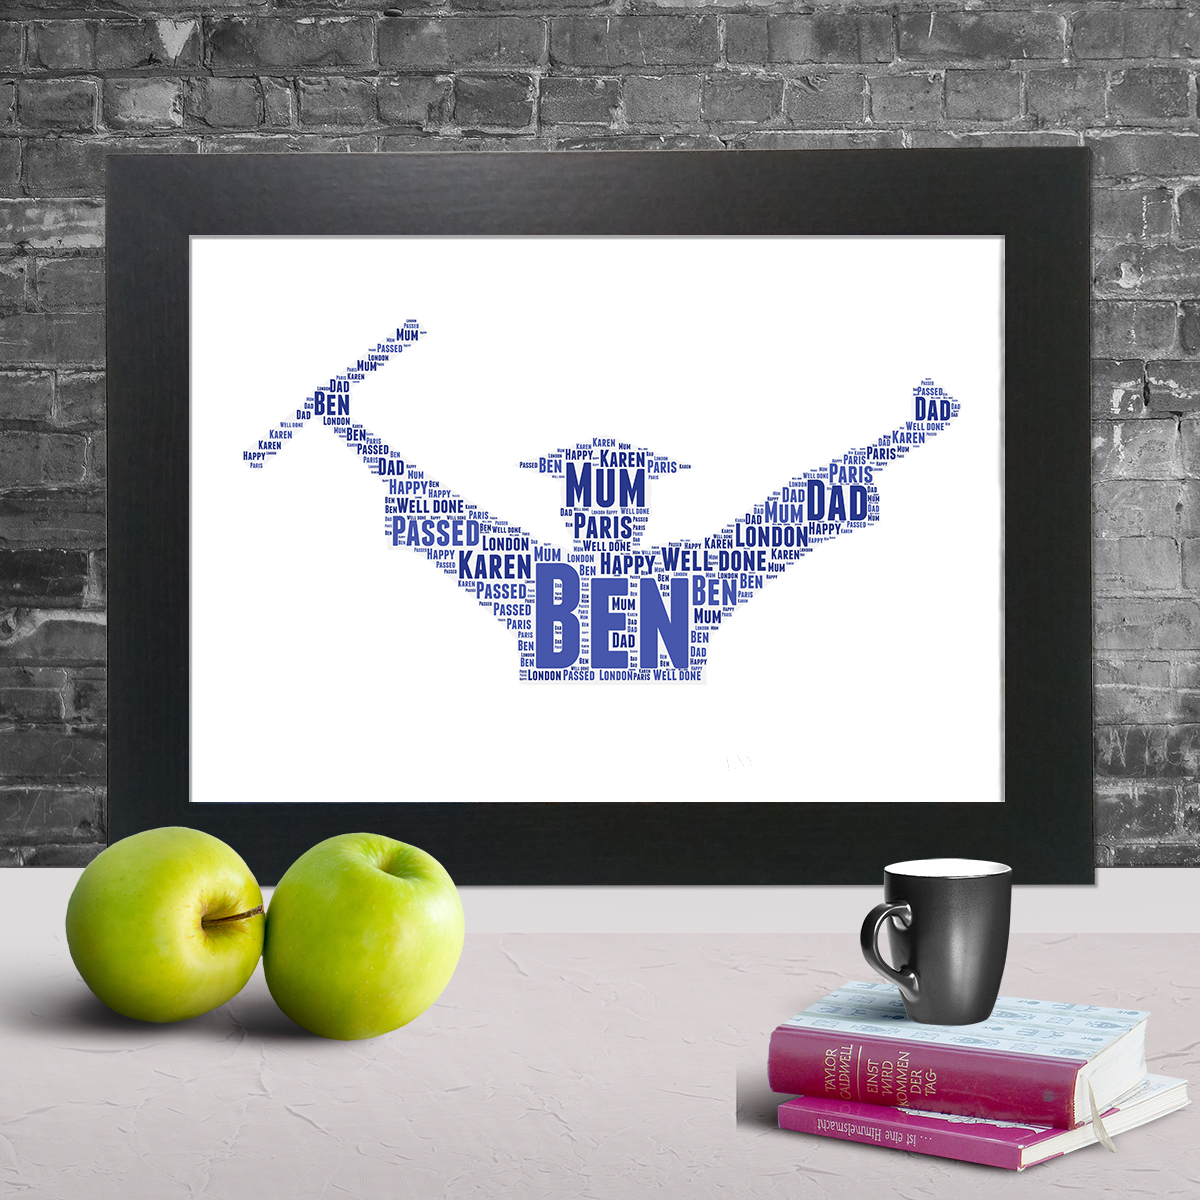 Graduation Photoshop Brushes Word Art Set / Chalkboard ...  |Word Art For Graduation